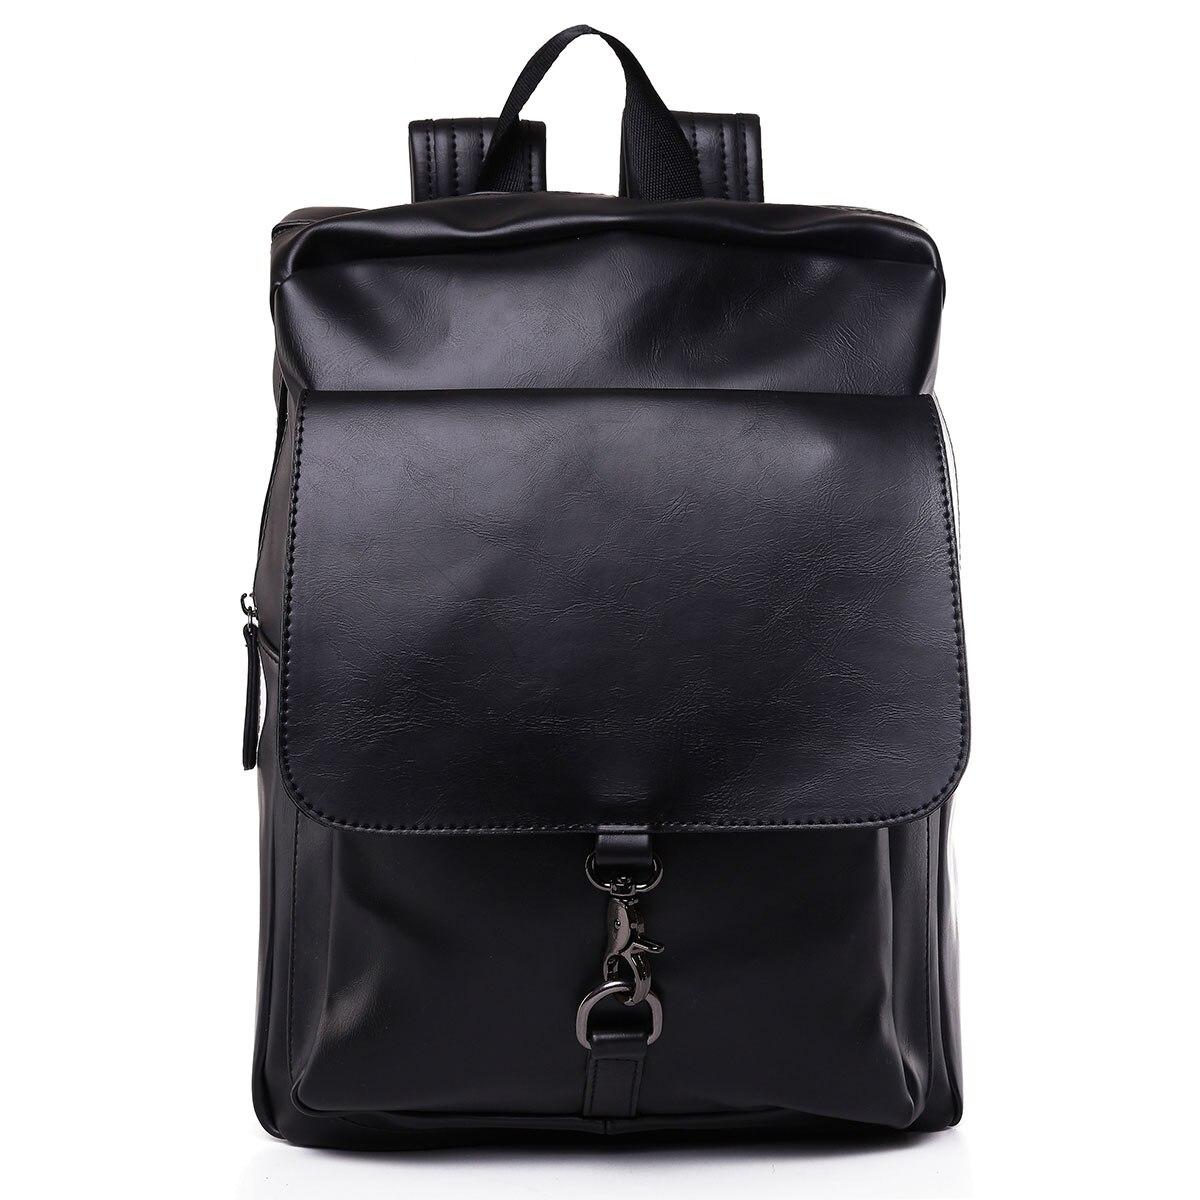 Fashion Men Women PU Leather Backpack School Bag Casual Travel Bookbag Black Youth Top Handle Backpack Back For School Mochila